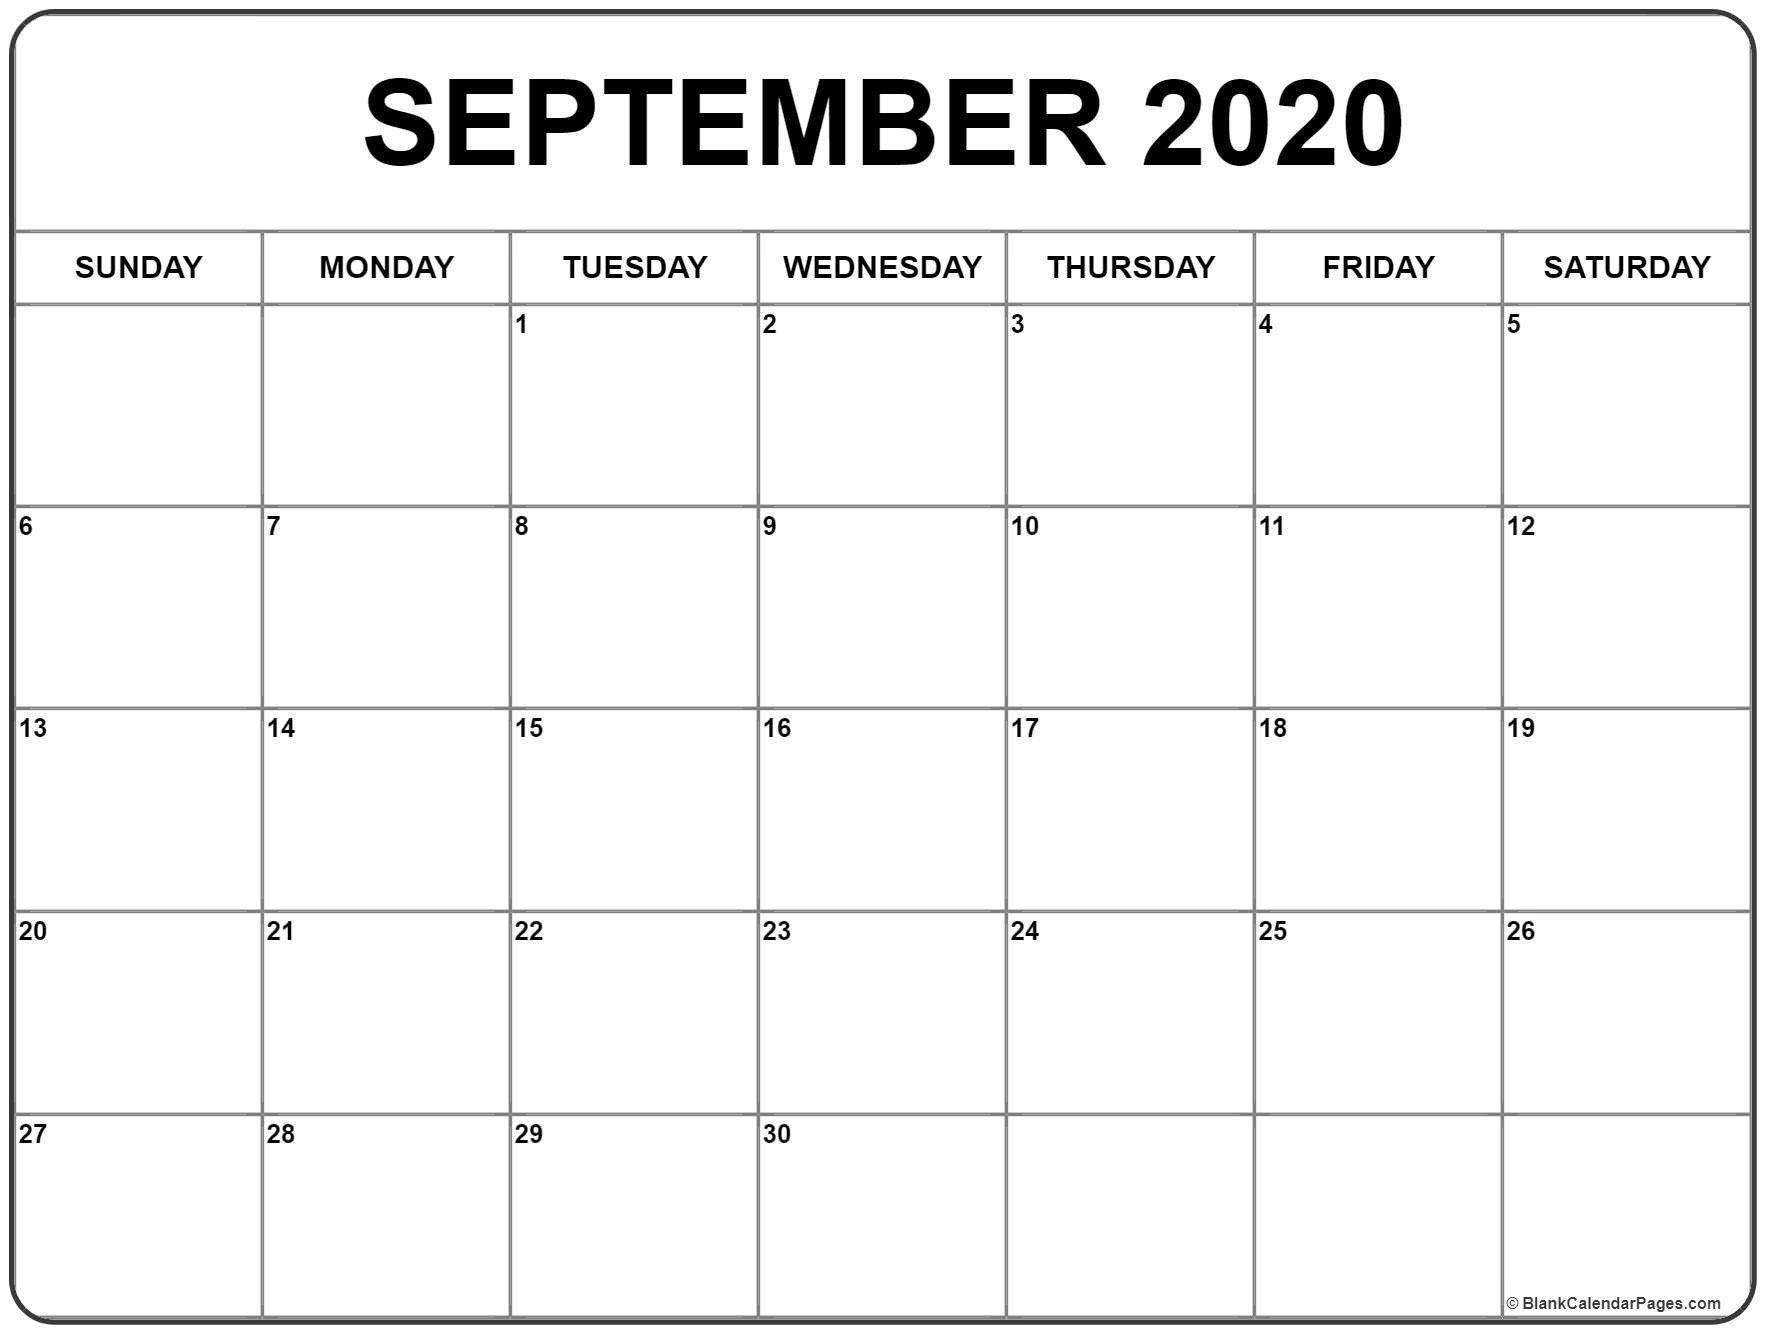 September 2020 Calendar With Holidays - Togo.wpart.co